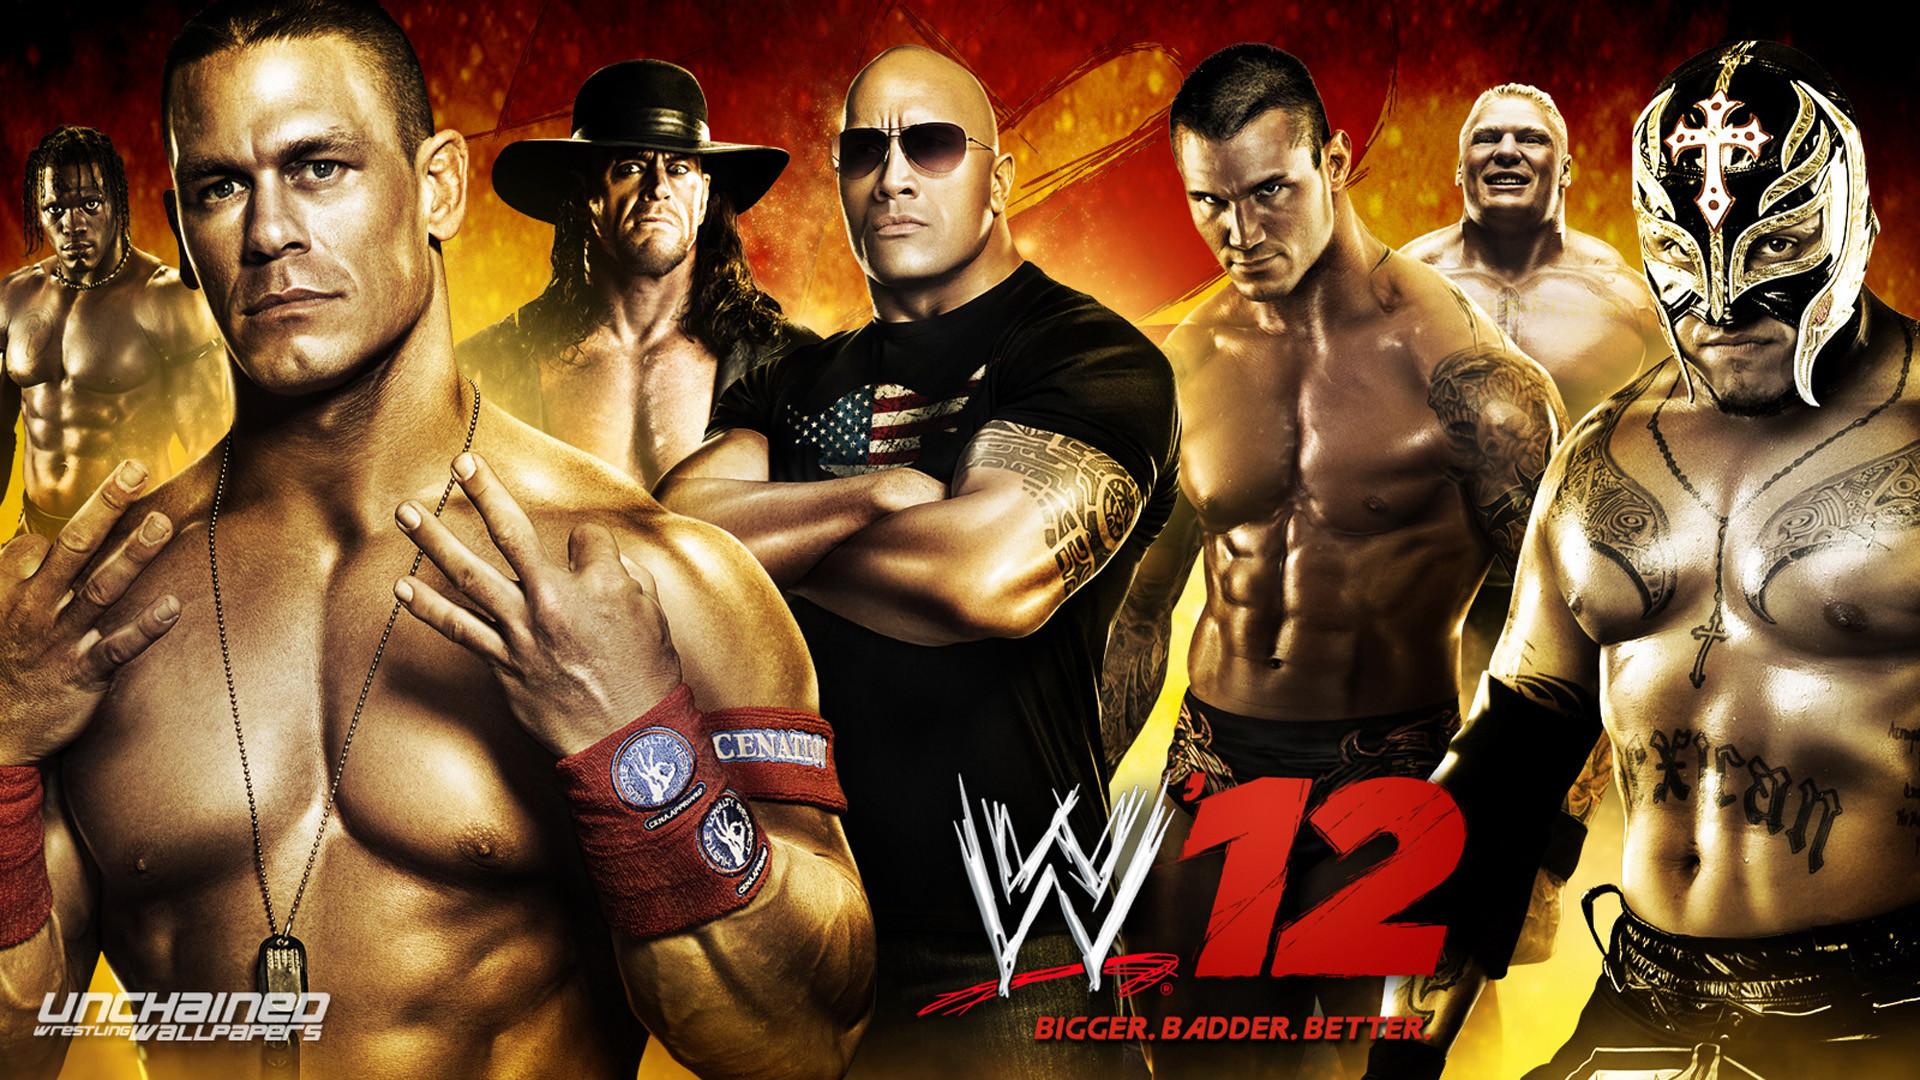 WWE Superstars Wallpapers Wallpaper 1680×1050 Wwe Image Wallpapers (61  Wallpapers)   Adorable